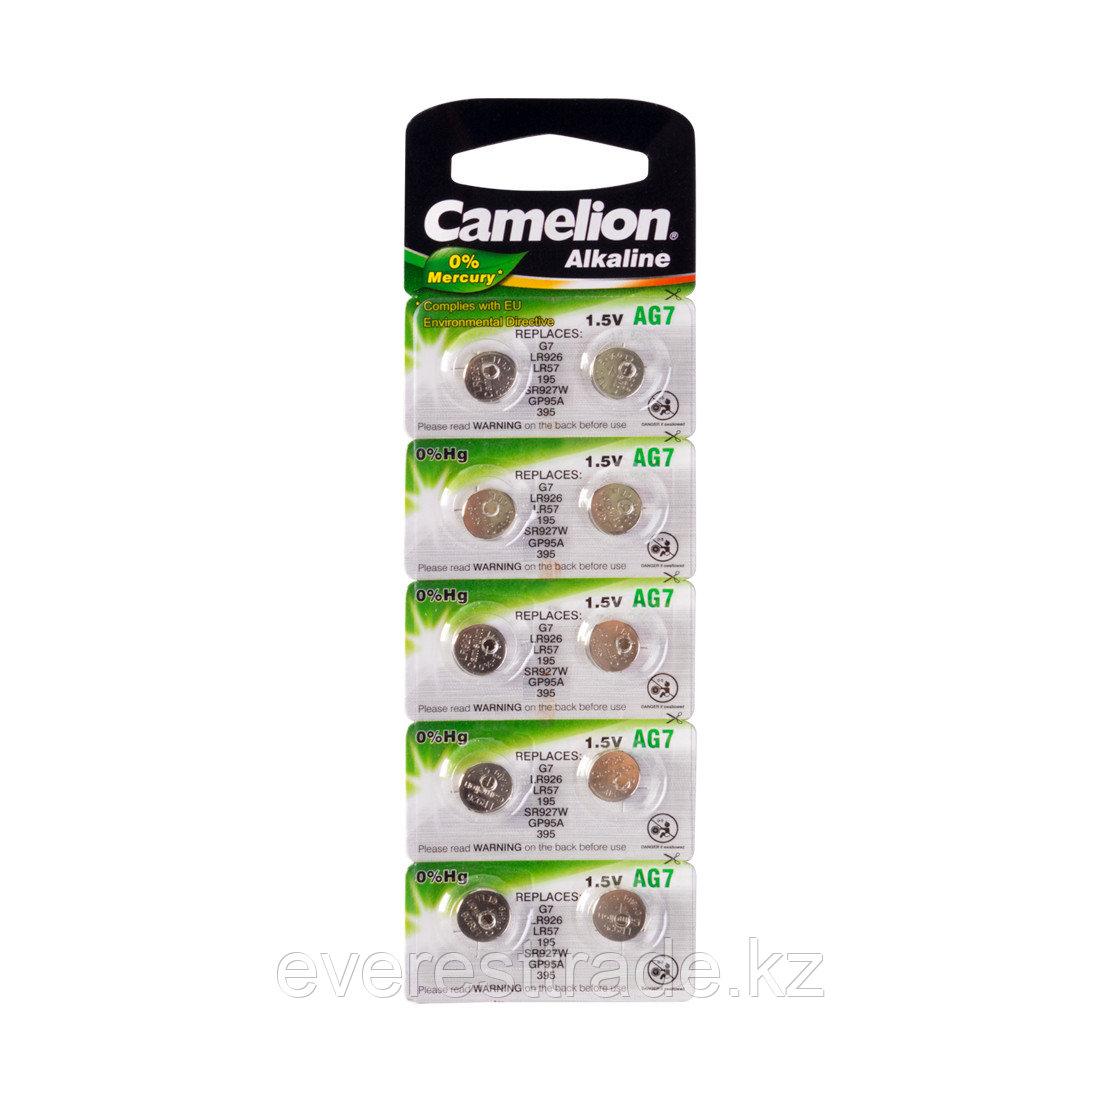 Camelion Батарейки,CAMELION, AG7-BP10, Alkaline, AG7, 1.5V, 0% Ртути, 10 шт. в блистере